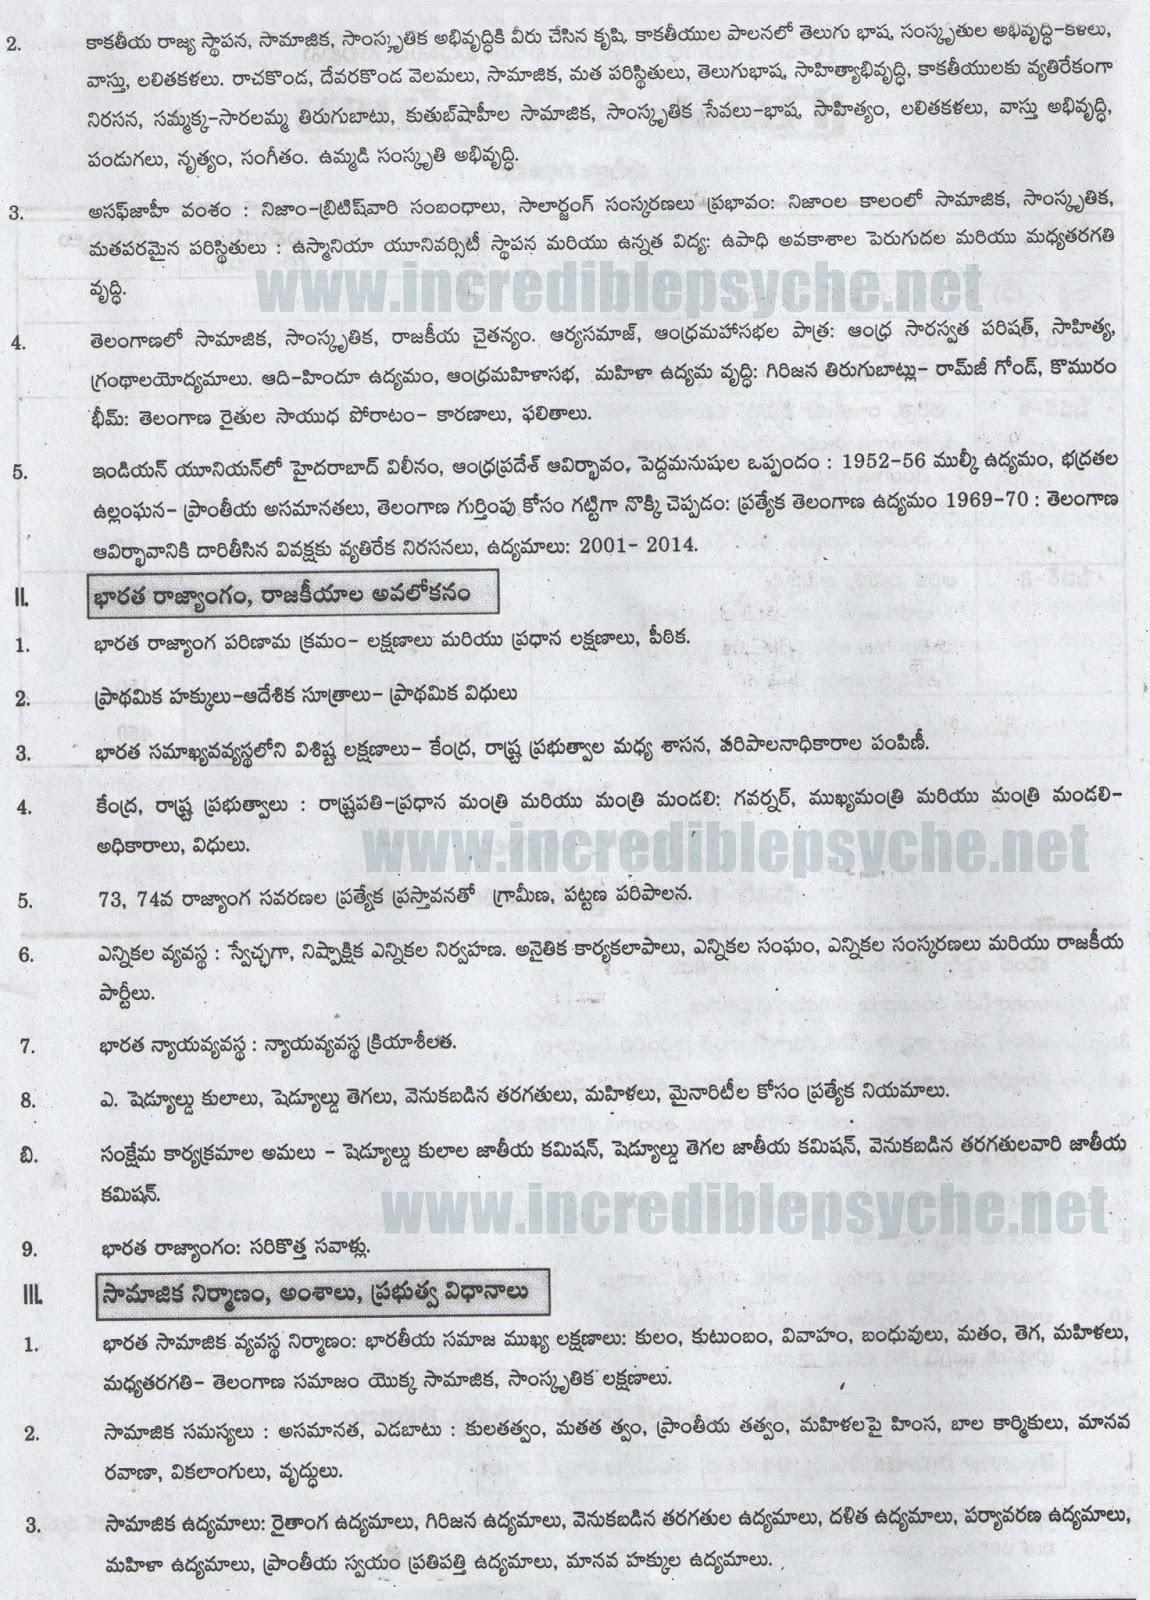 telangana tspsc group 3 exam syllabus in telugu with scheme of exam pattern detailed pattern 1